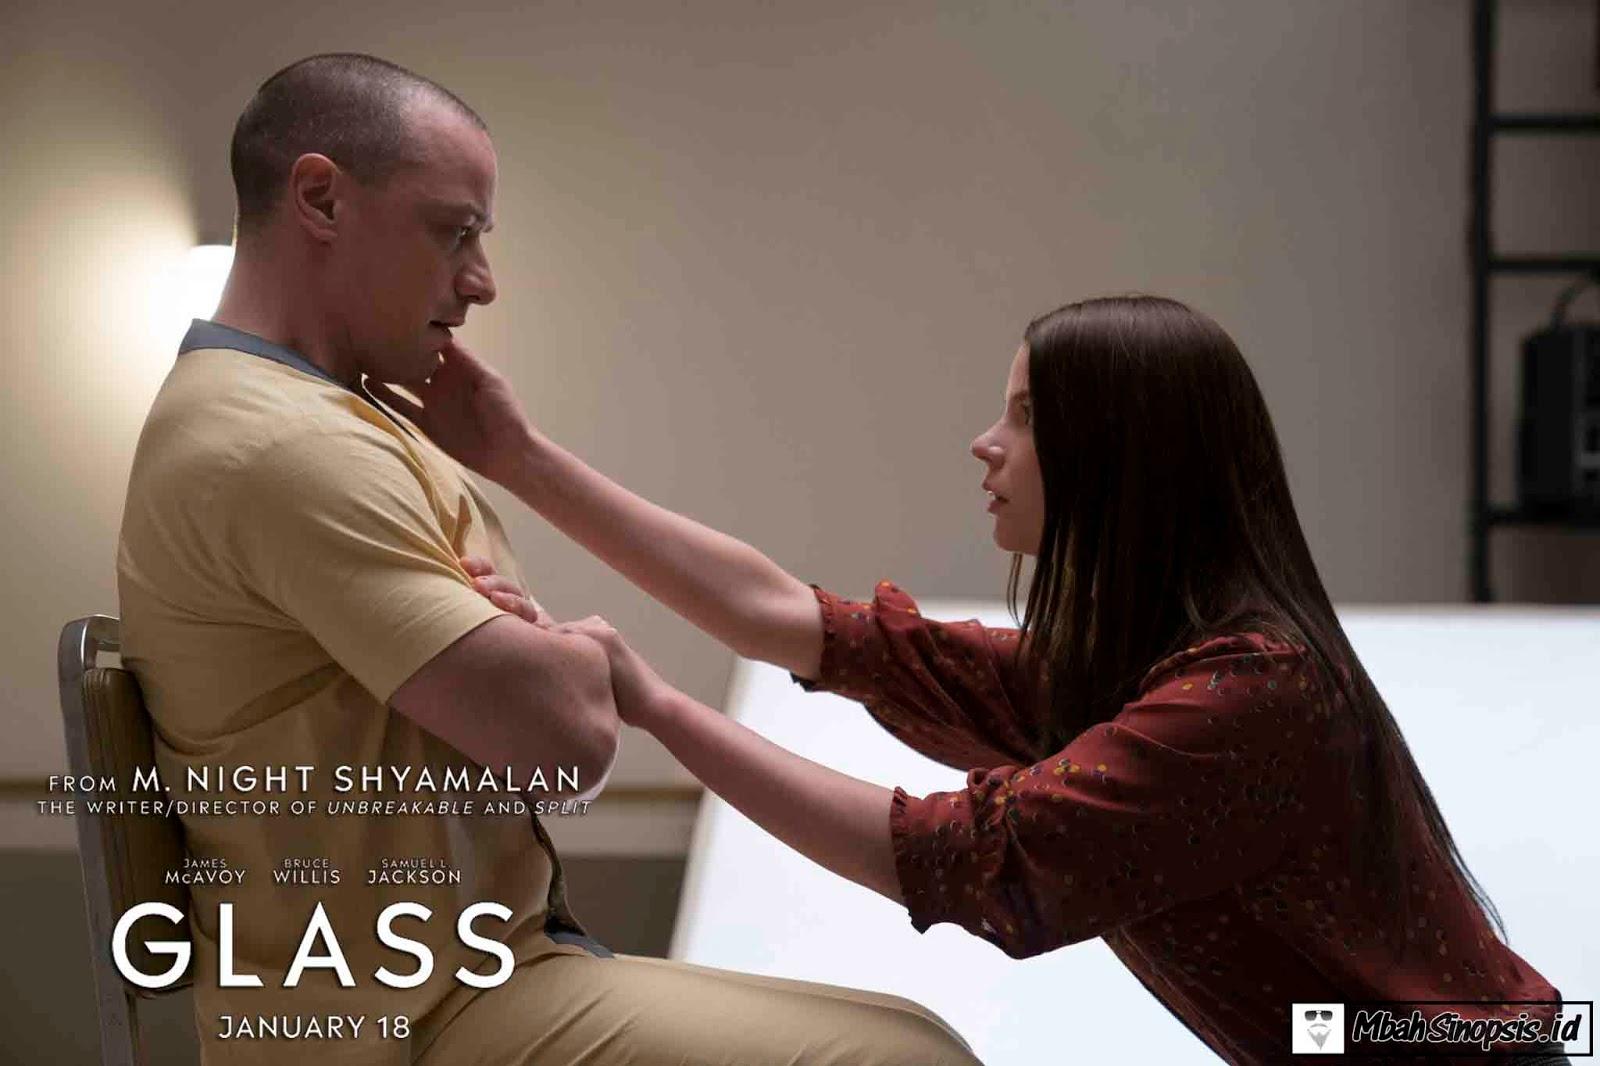 m night shyamalan movie 2019 Sinopsis Film Glass 2019 Pertarungan Mr Glass The Beast